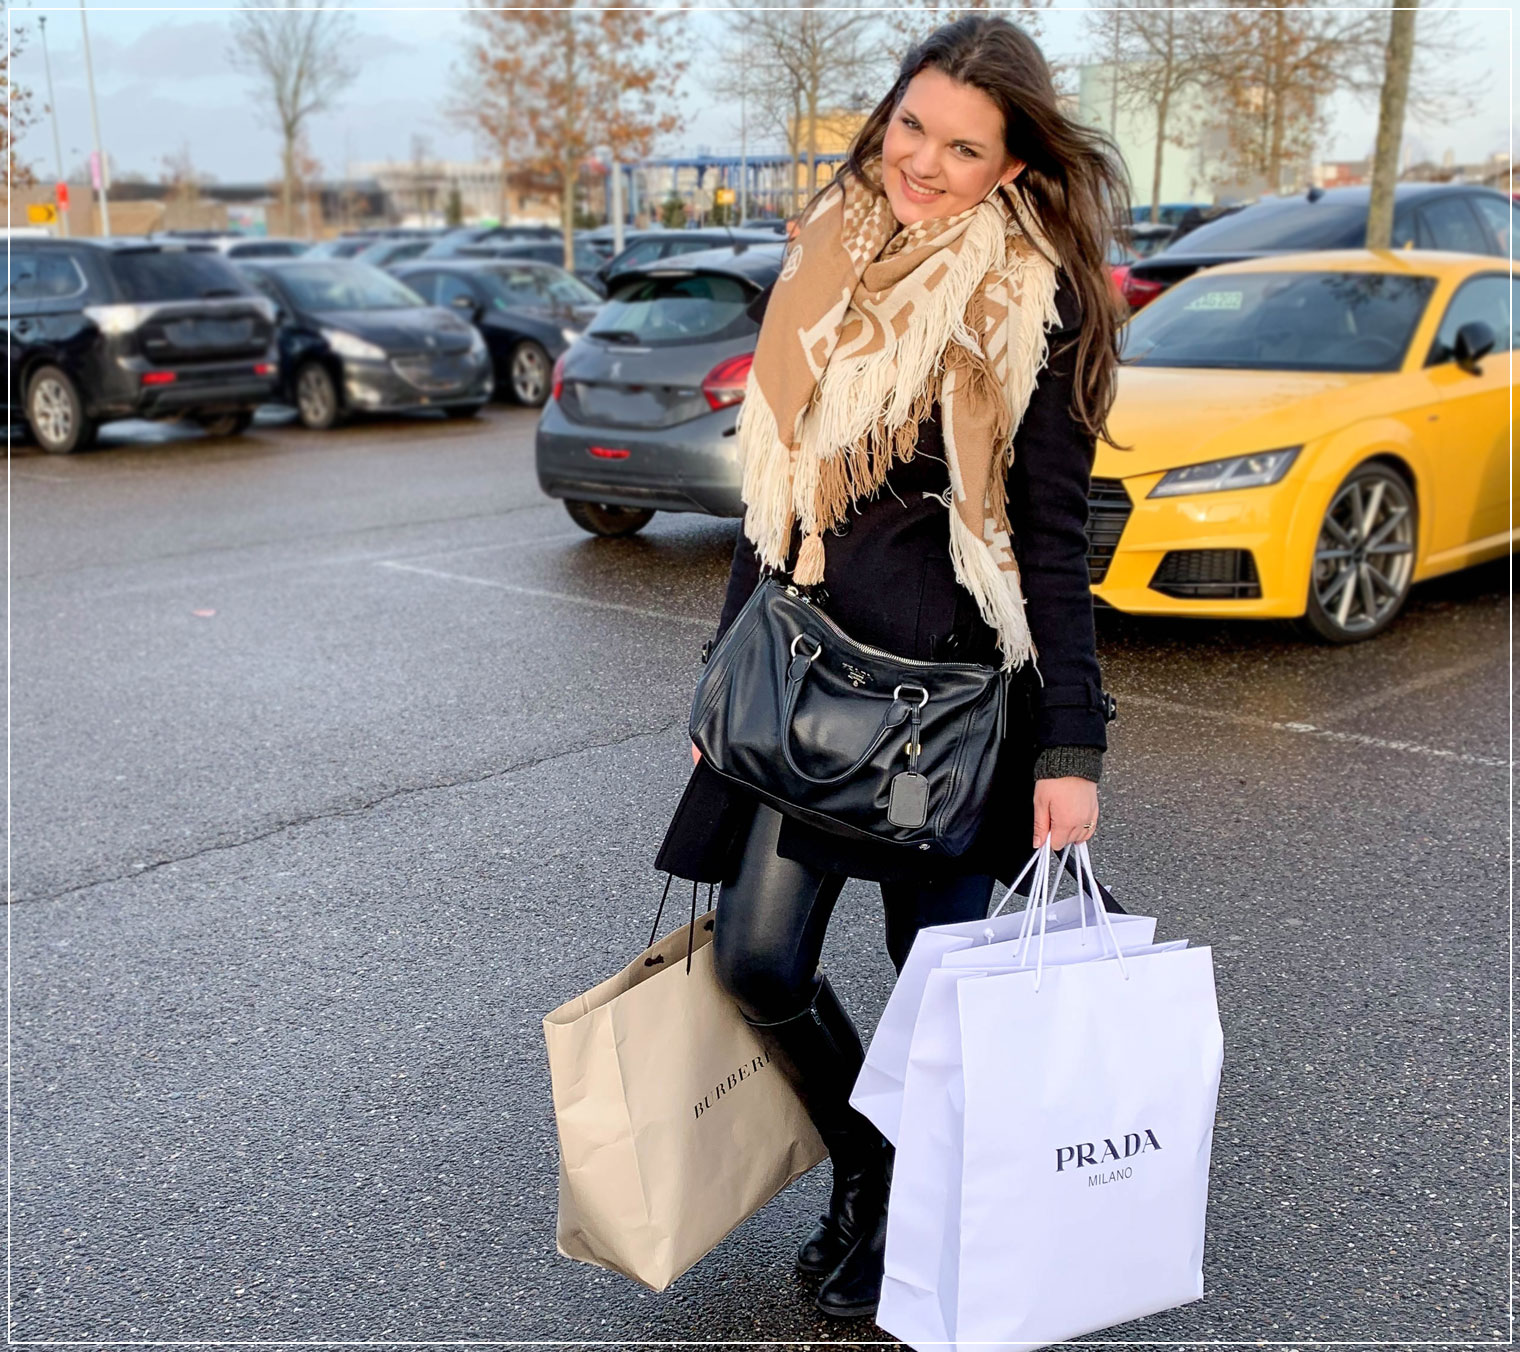 Jahresrückblick, Shopping-Tipps, Blogger Leben, Blogger Urlaub, Outlet Shopping, Roermond, Designer Outlet, Modetrends, Blogger, Fashionblogger, Ruhrgebiet